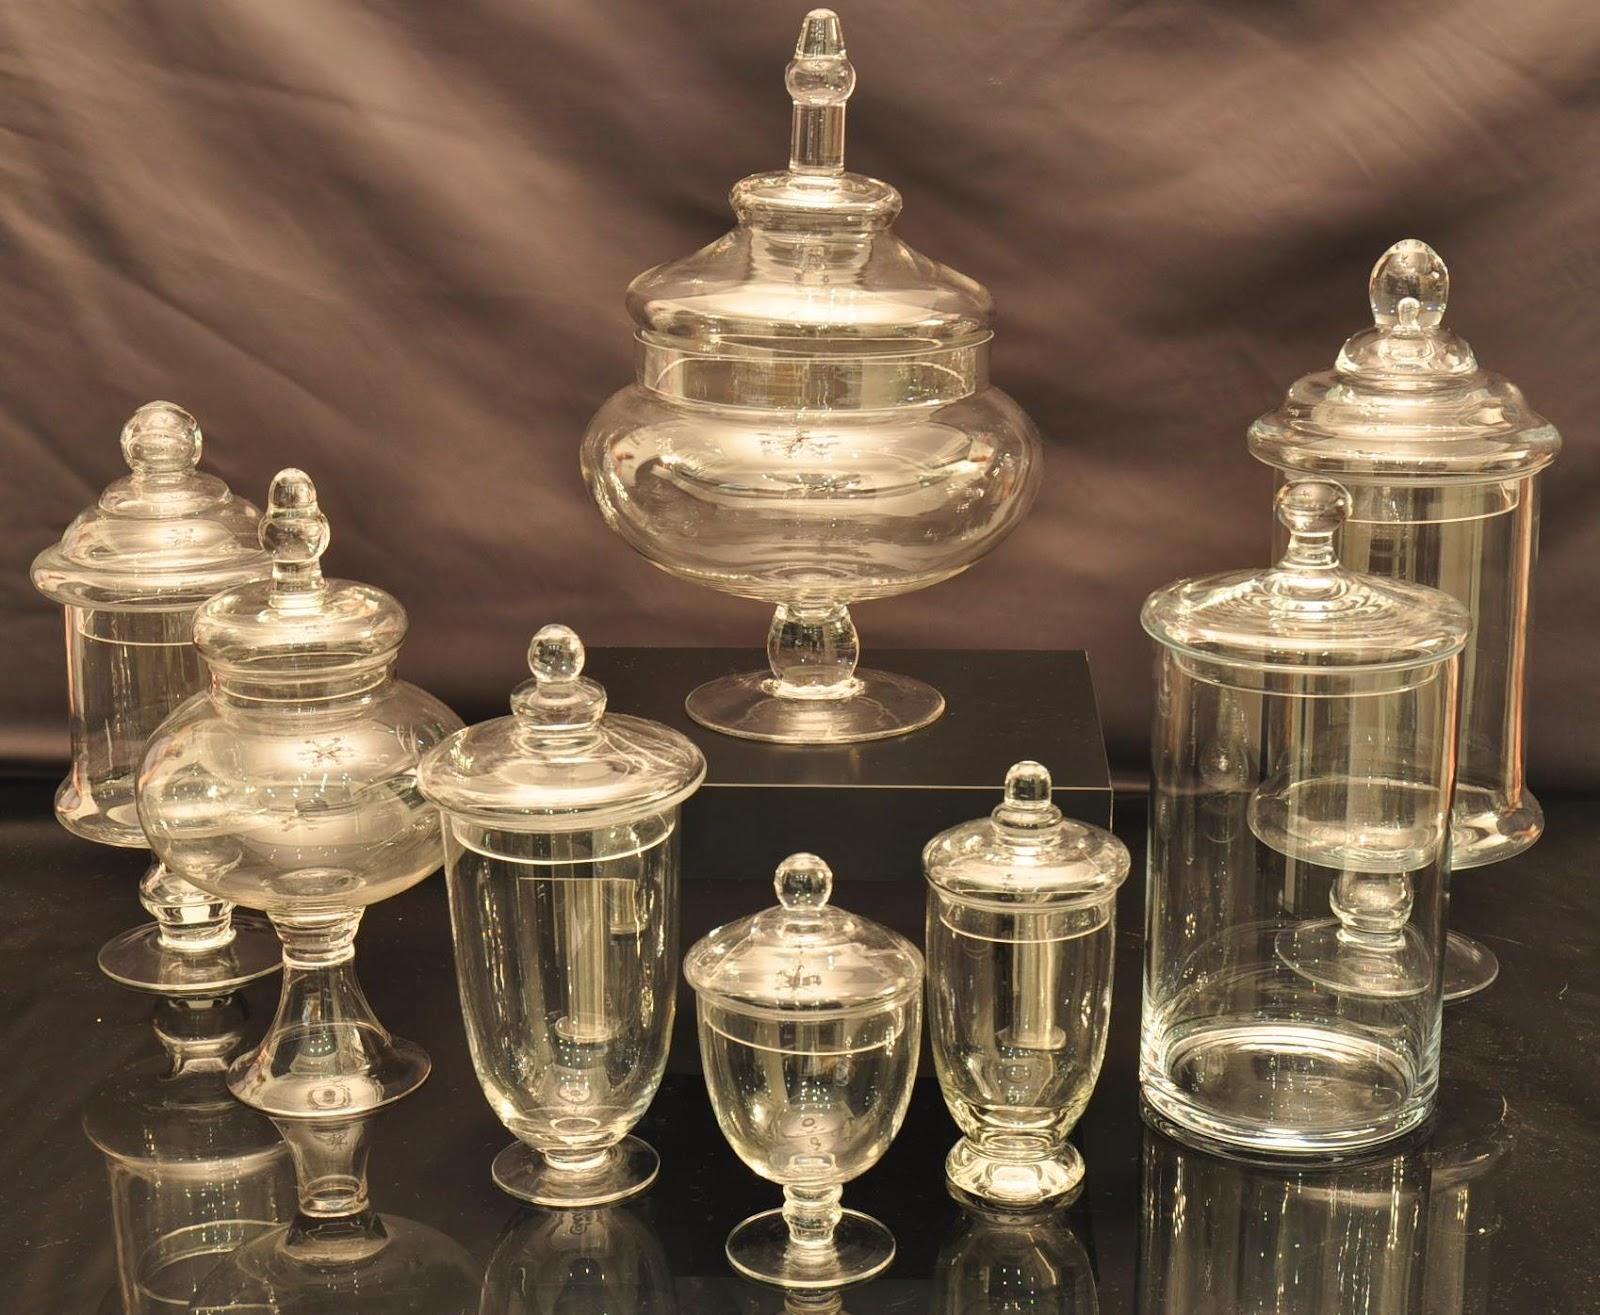 discount vases b y fashion stainless steel vase home. Black Bedroom Furniture Sets. Home Design Ideas